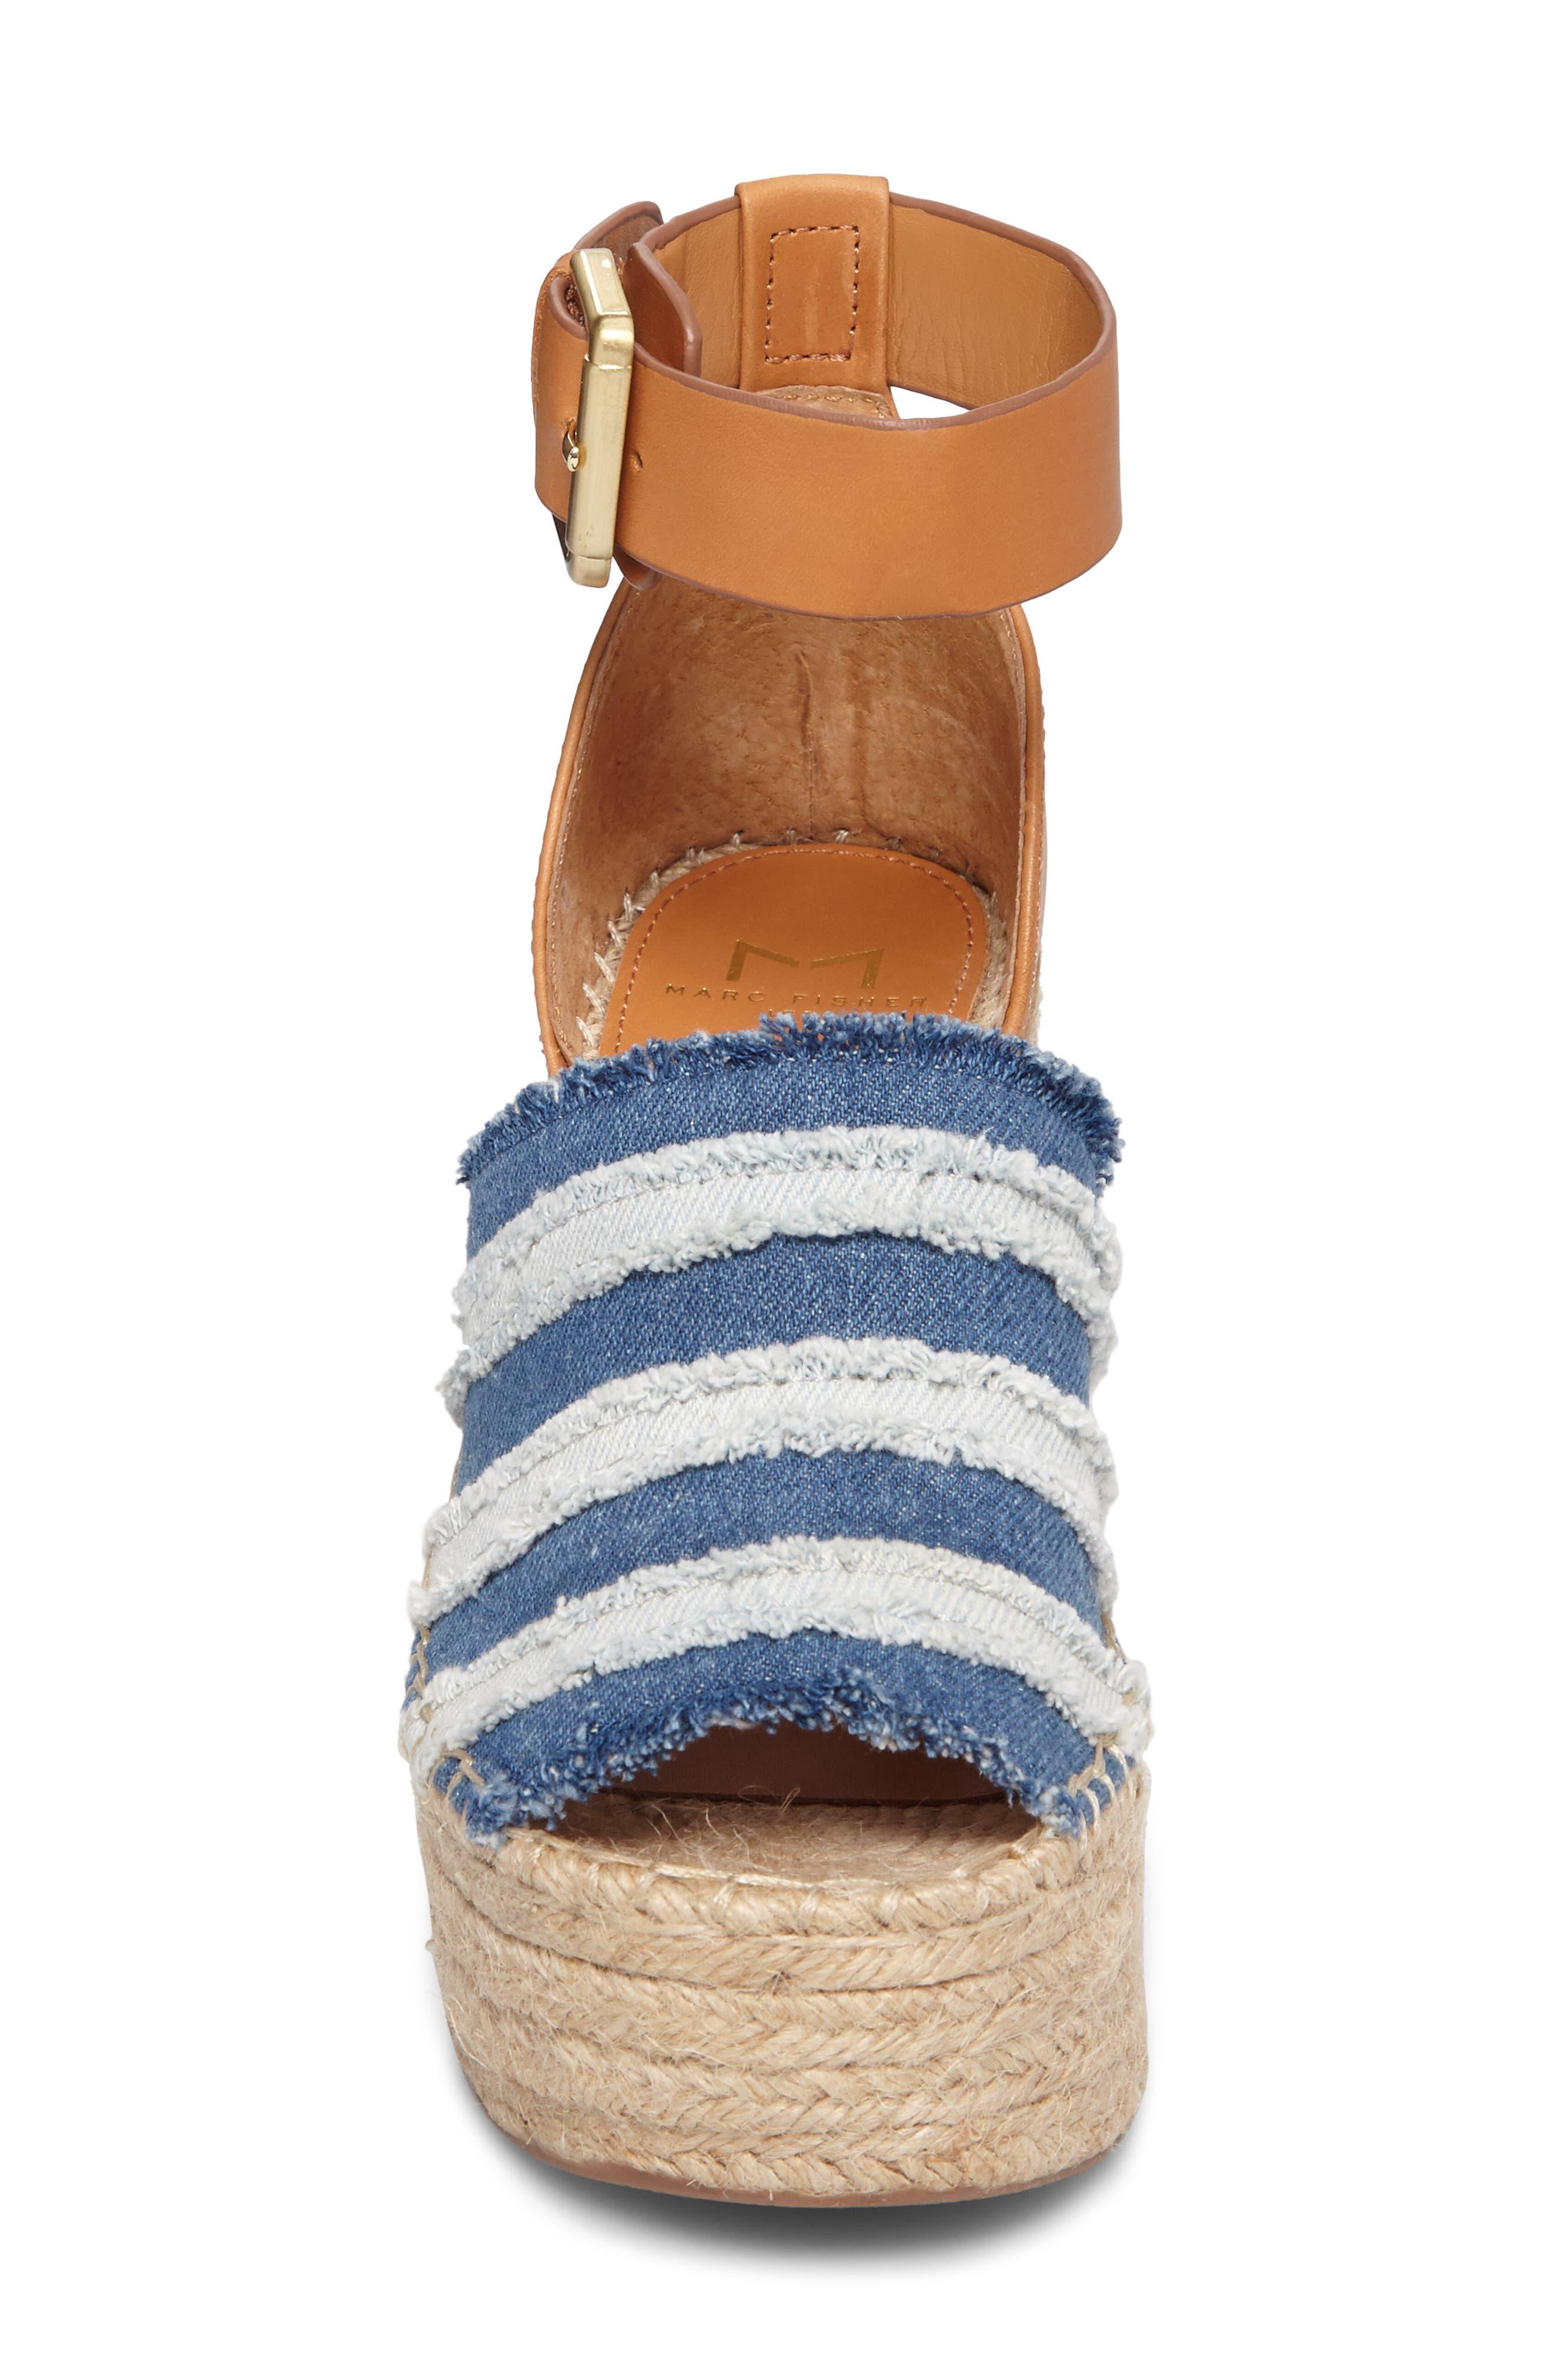 Adria Wedge Sandal,                             Alternate thumbnail 4, color,